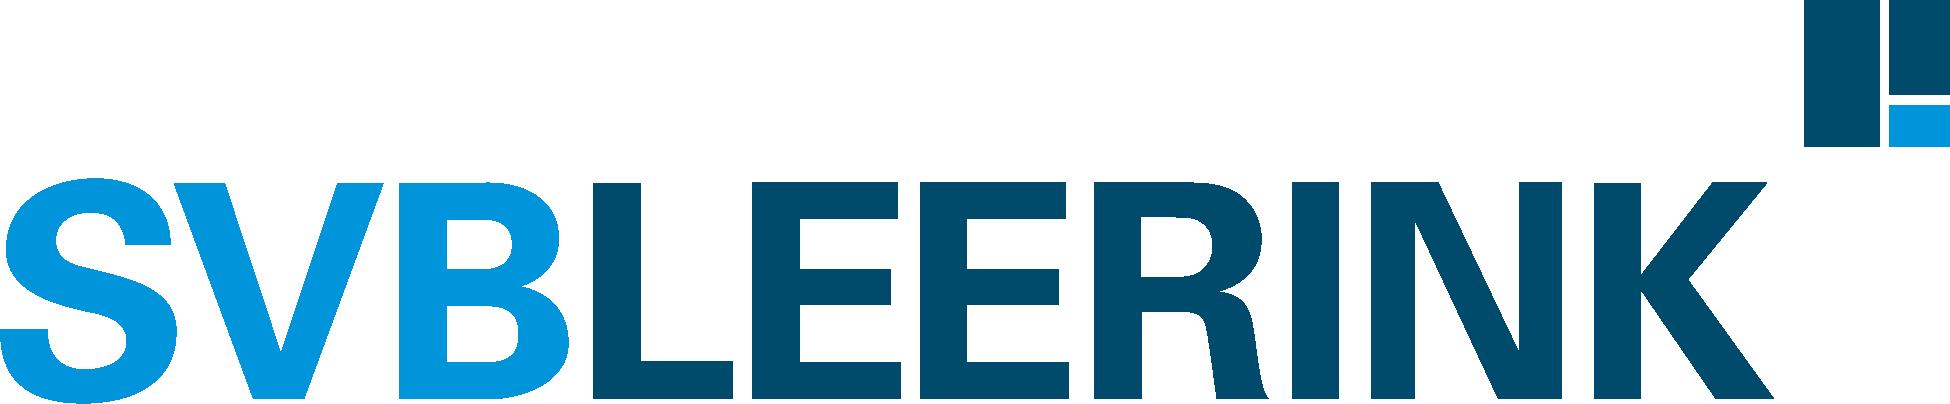 SVBLeerink_logo_Full-color_Preferred_RGB.png